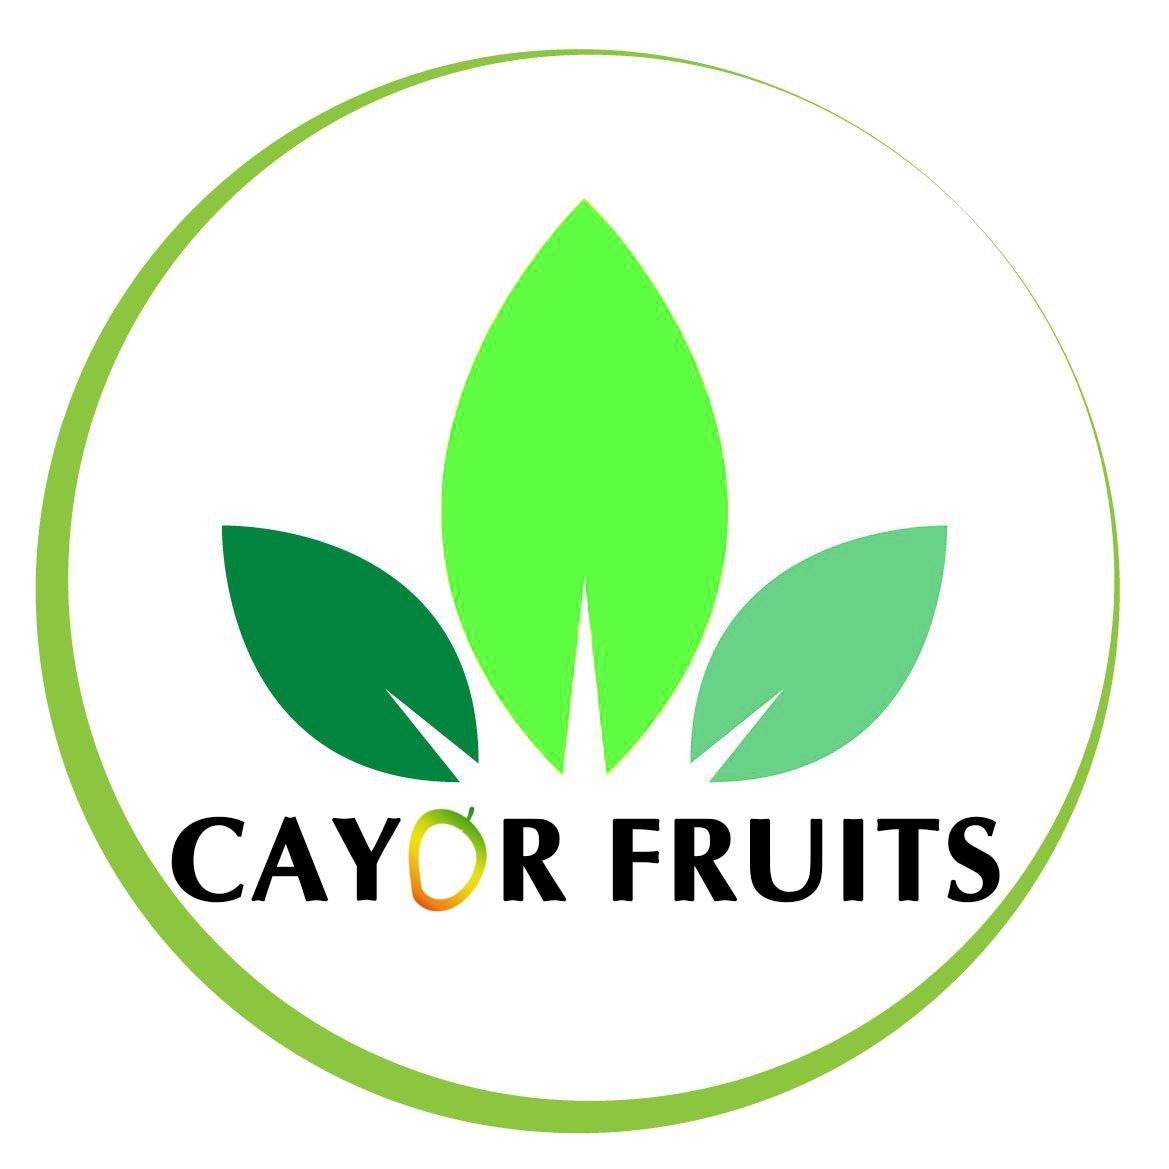 Cayor Fruits